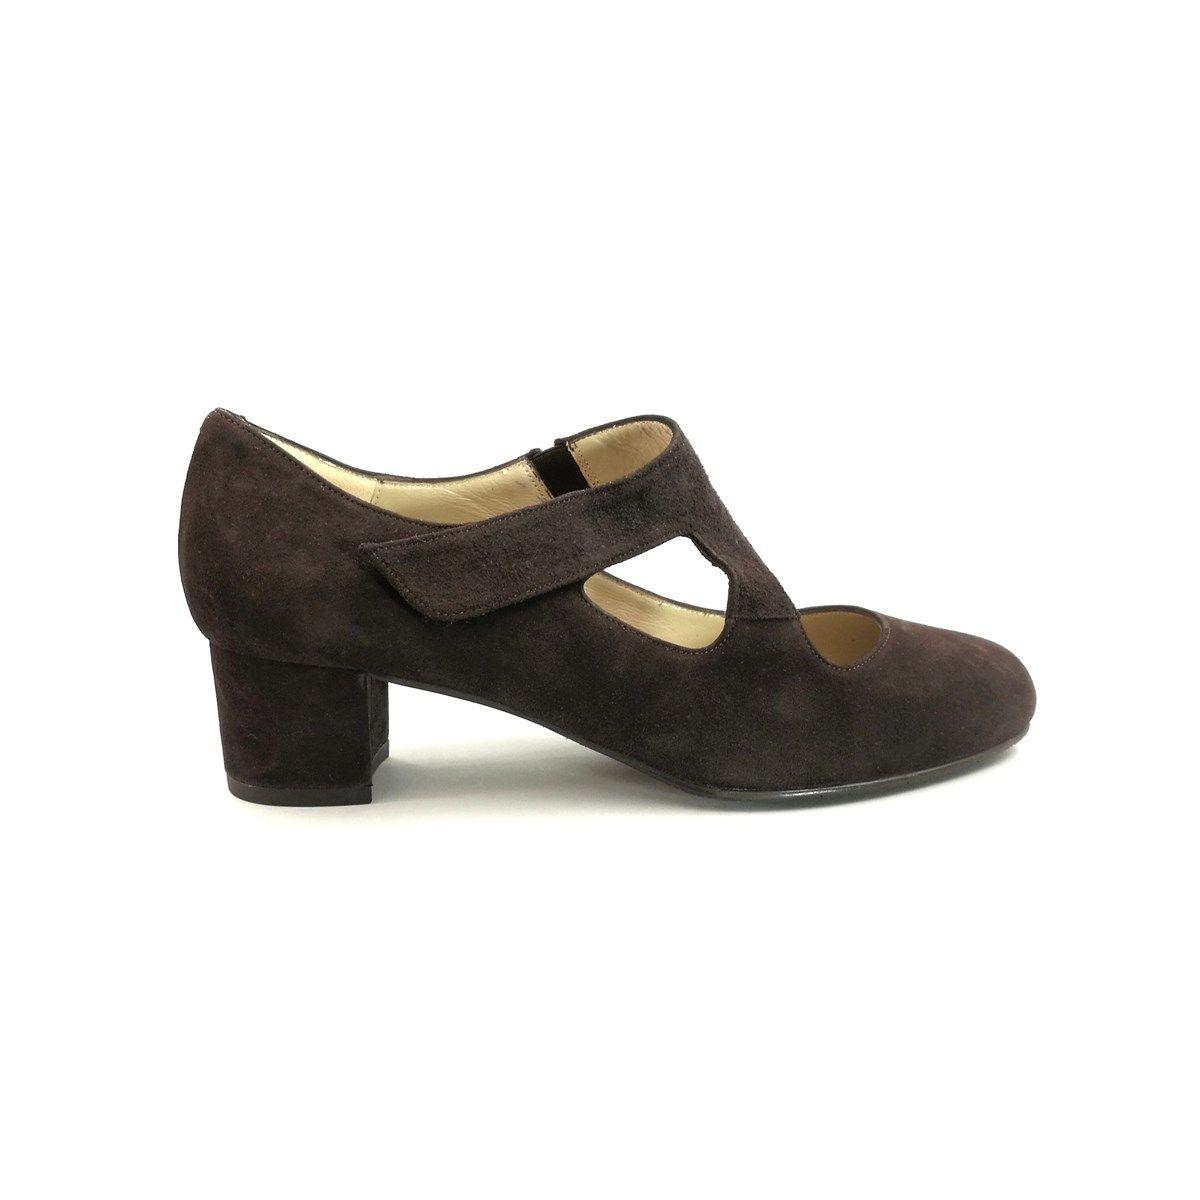 chaussure pointure 35 petit talon